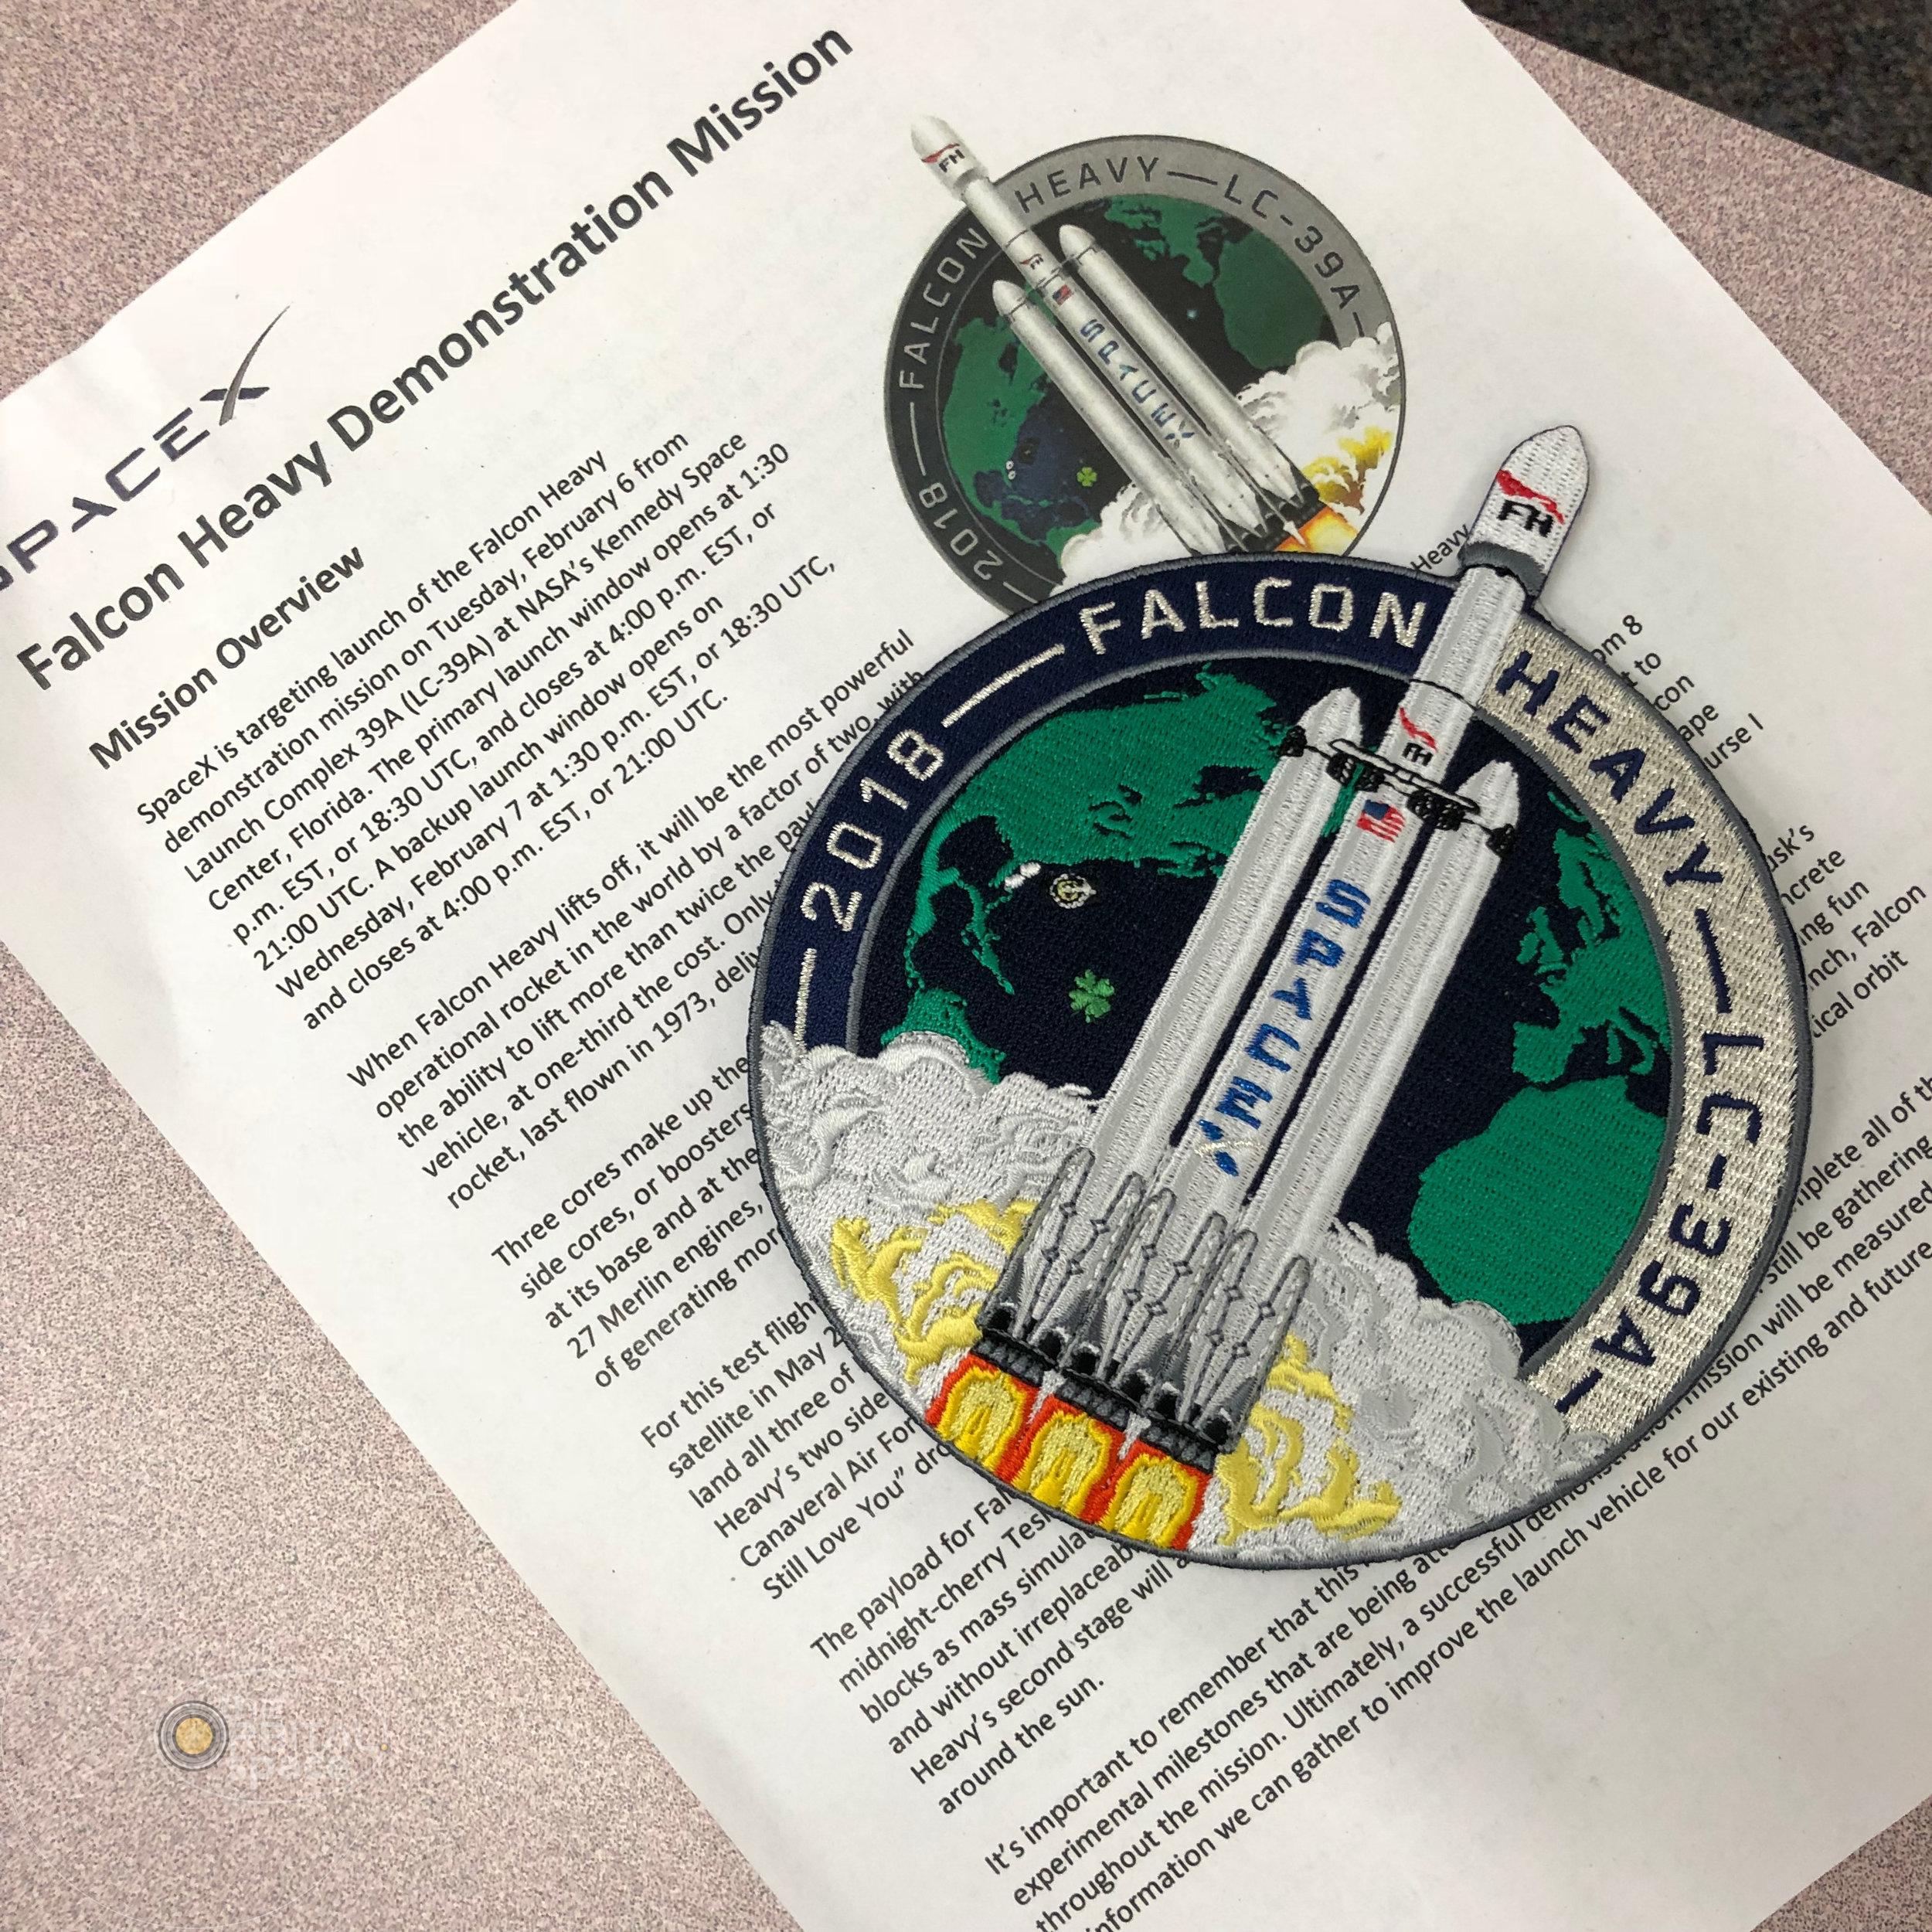 Falcon Heavy Press Briefing & Patch